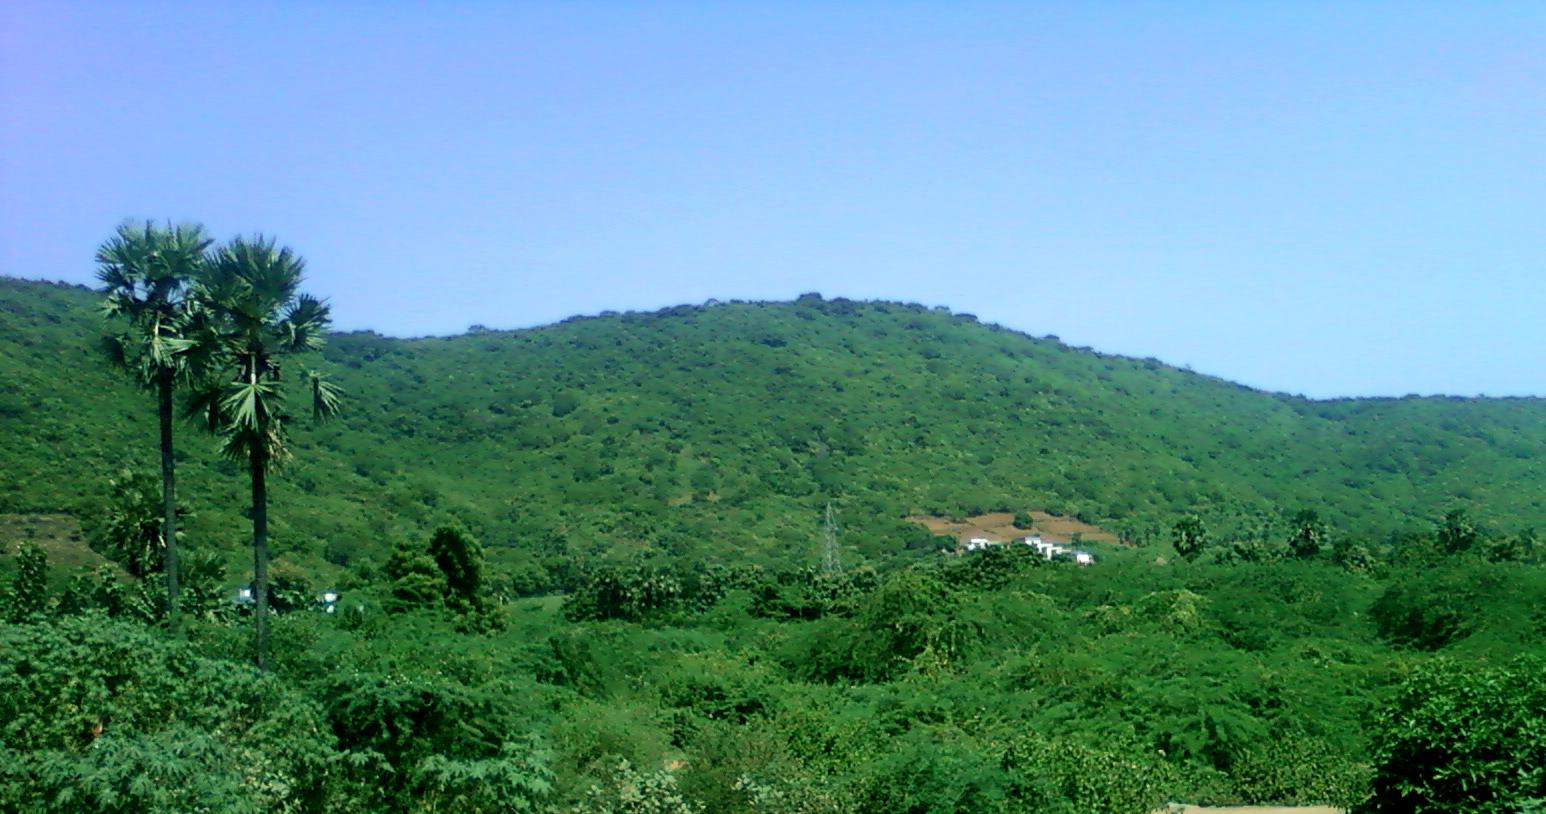 File:Landscape view at Tuni.jpg - Wikimedia Commons